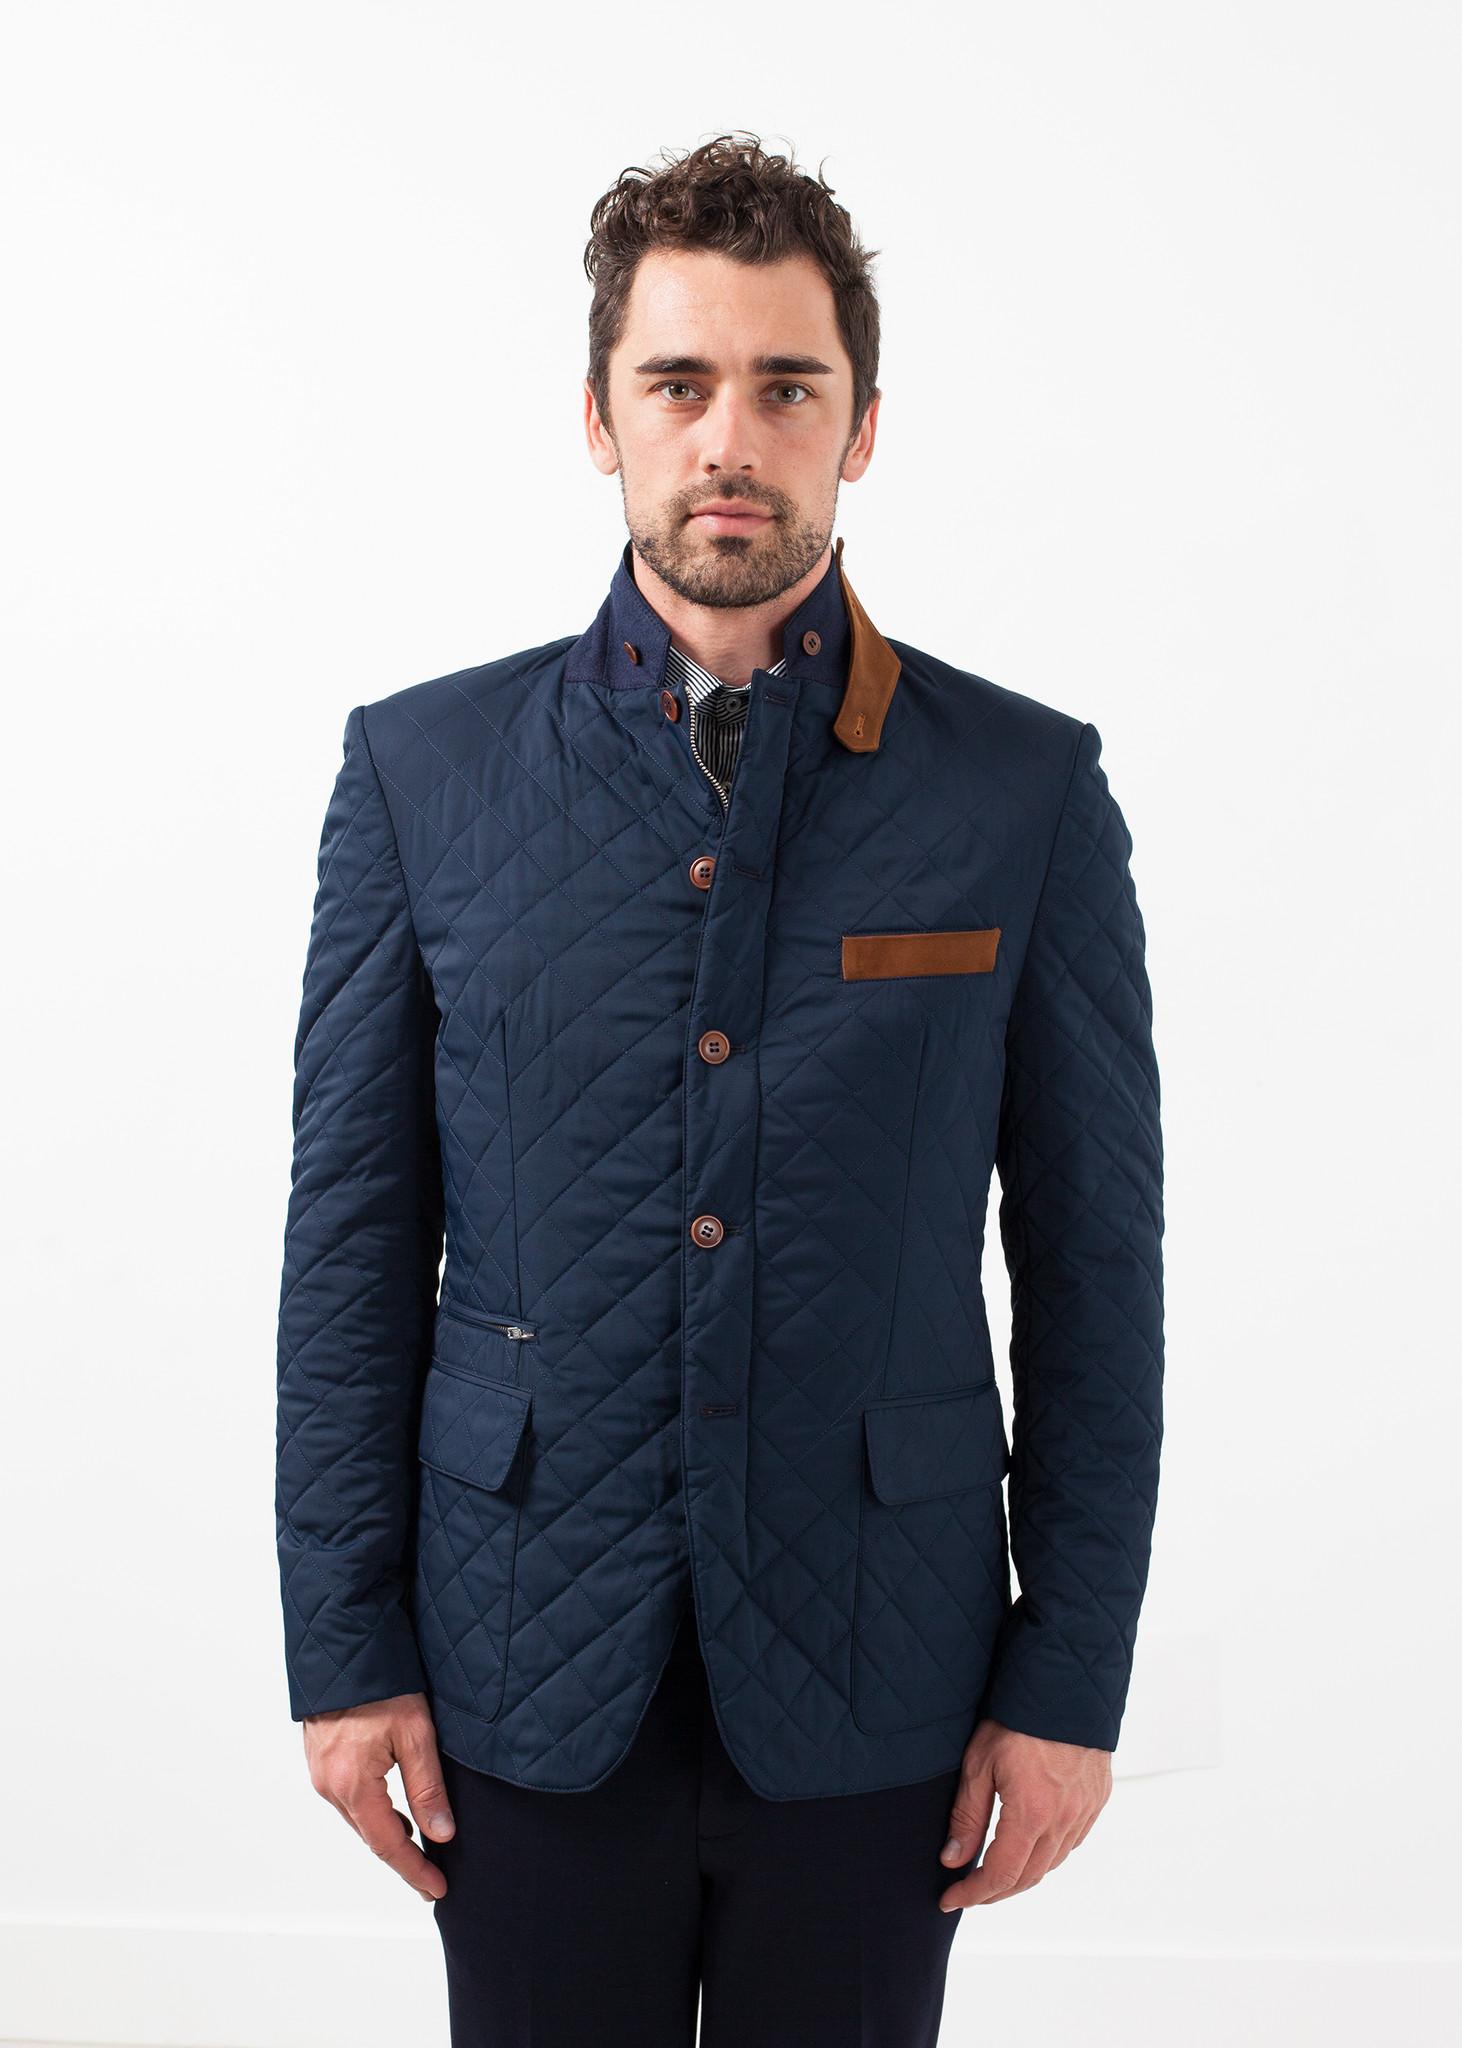 men 39 s circle of gentlemen milton jacket navy garmentory. Black Bedroom Furniture Sets. Home Design Ideas